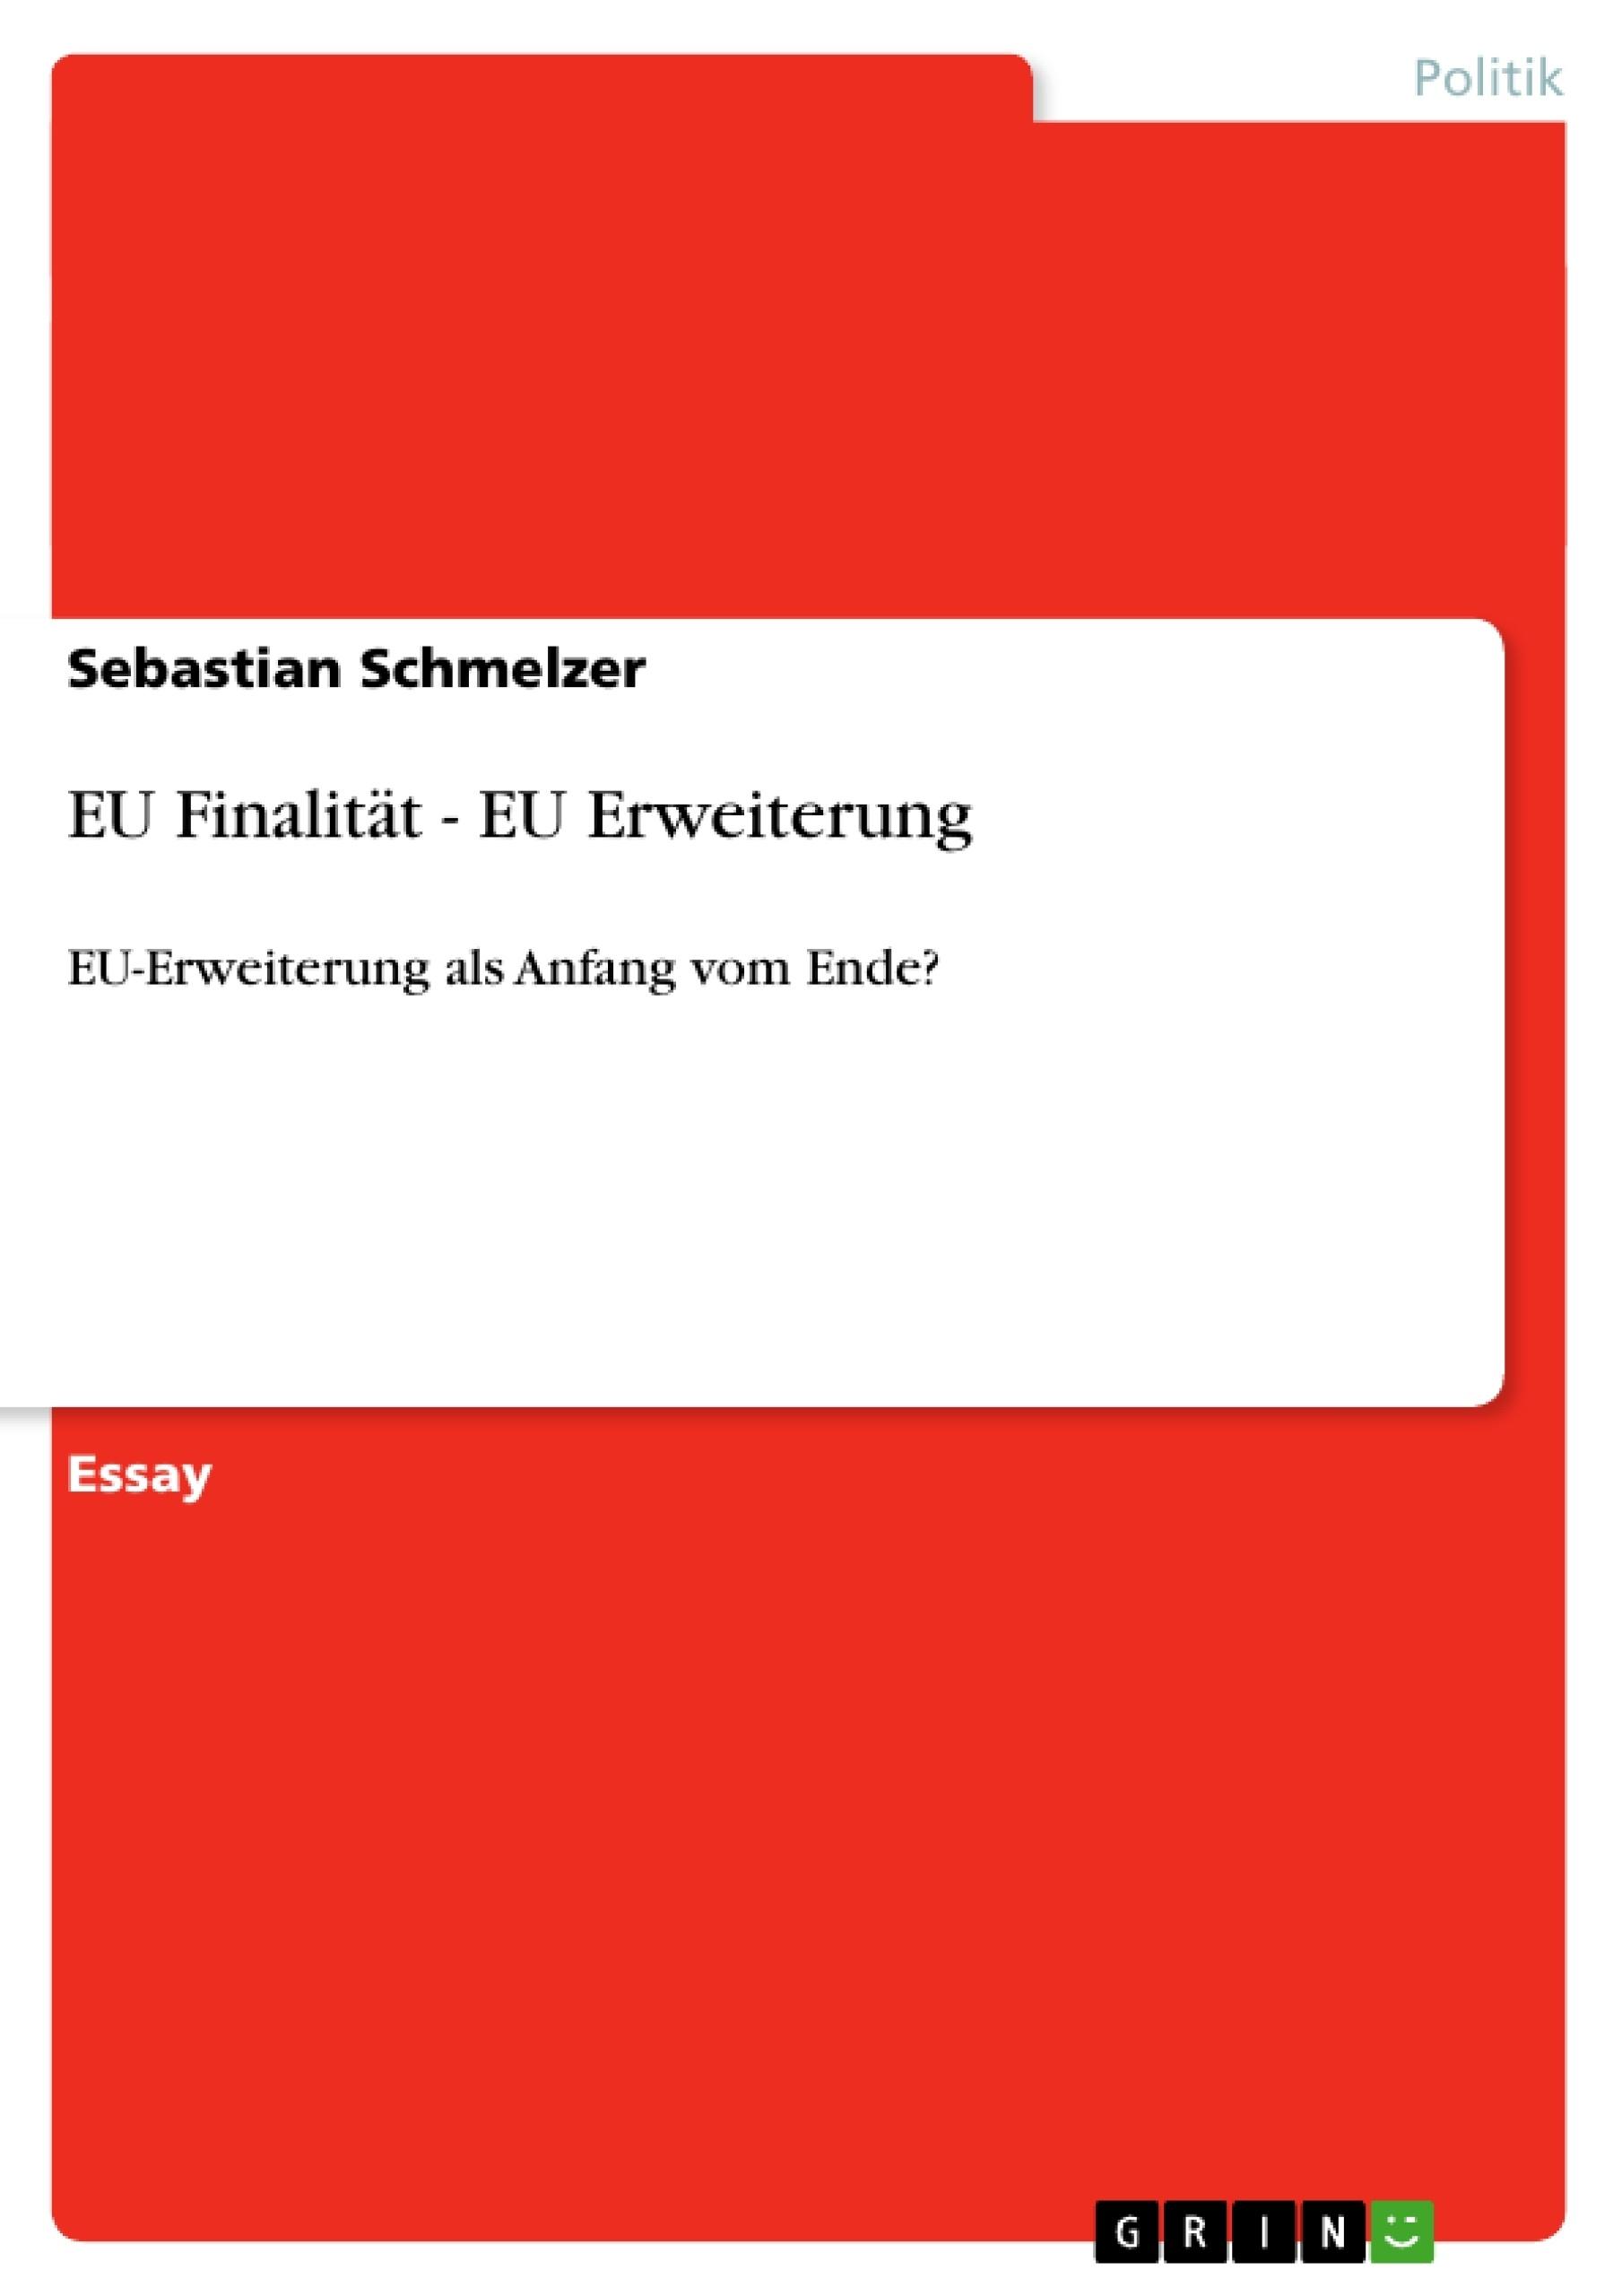 Titel: EU Finalität - EU Erweiterung